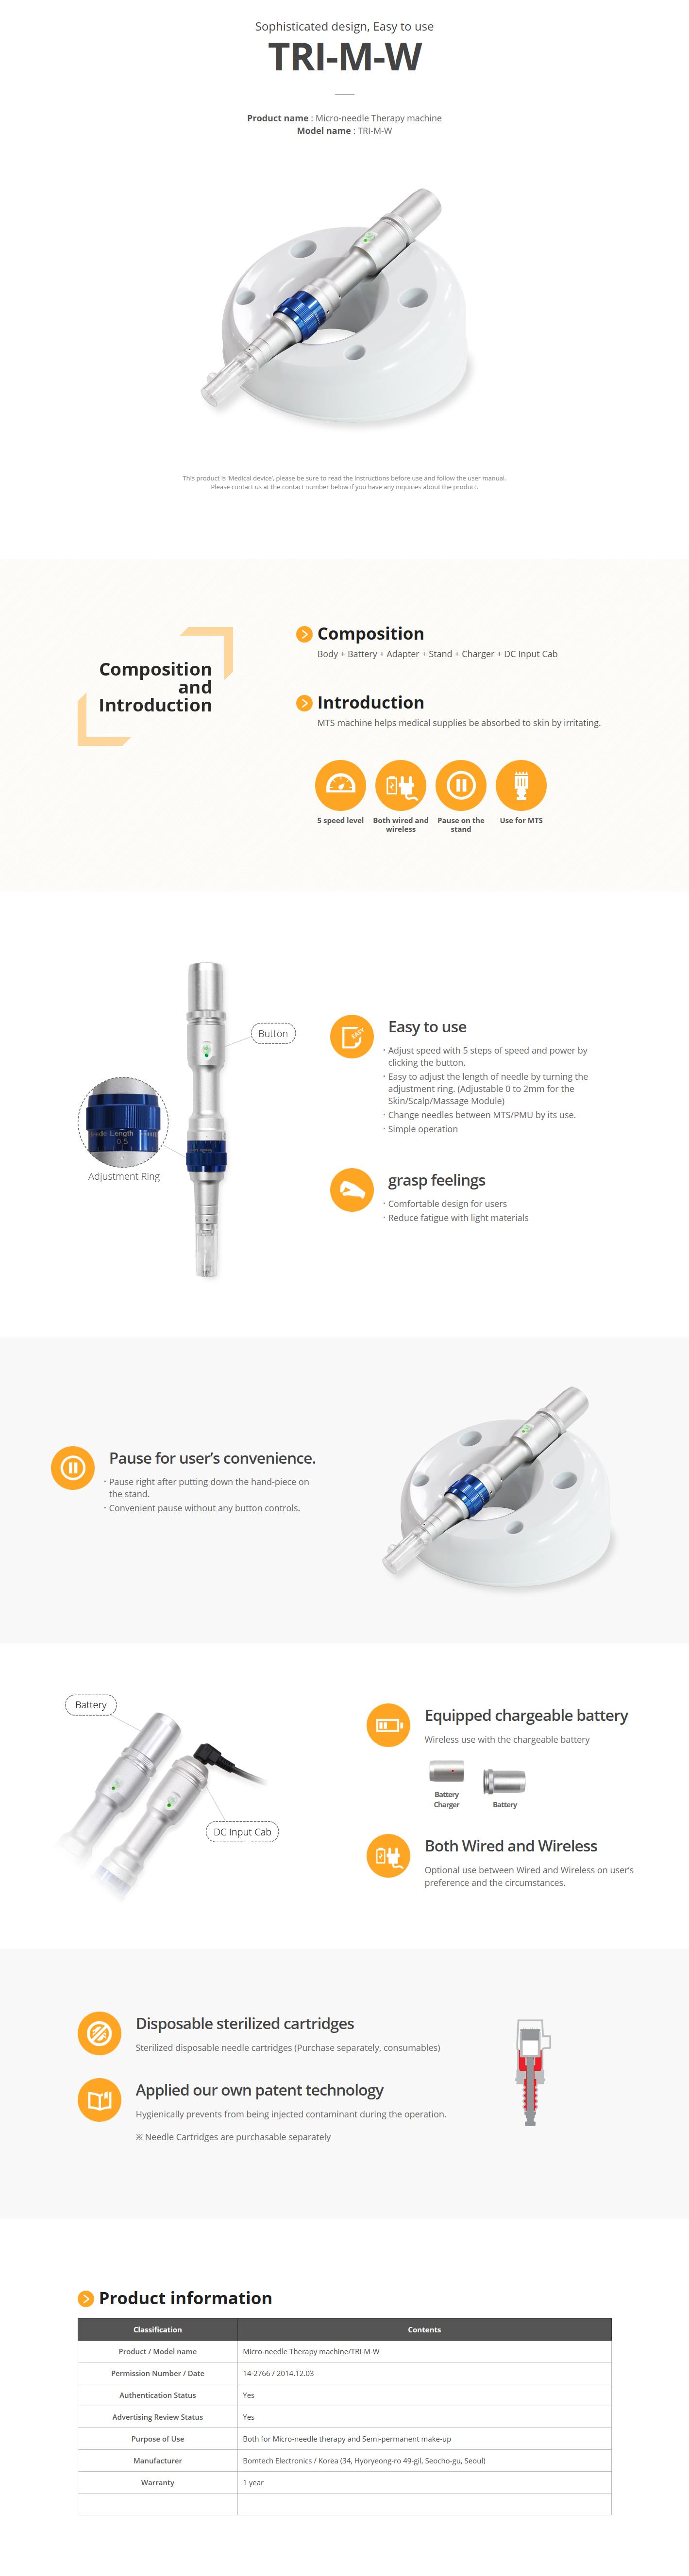 Bomtech Micro-needle Therapy machine TRI-M-W